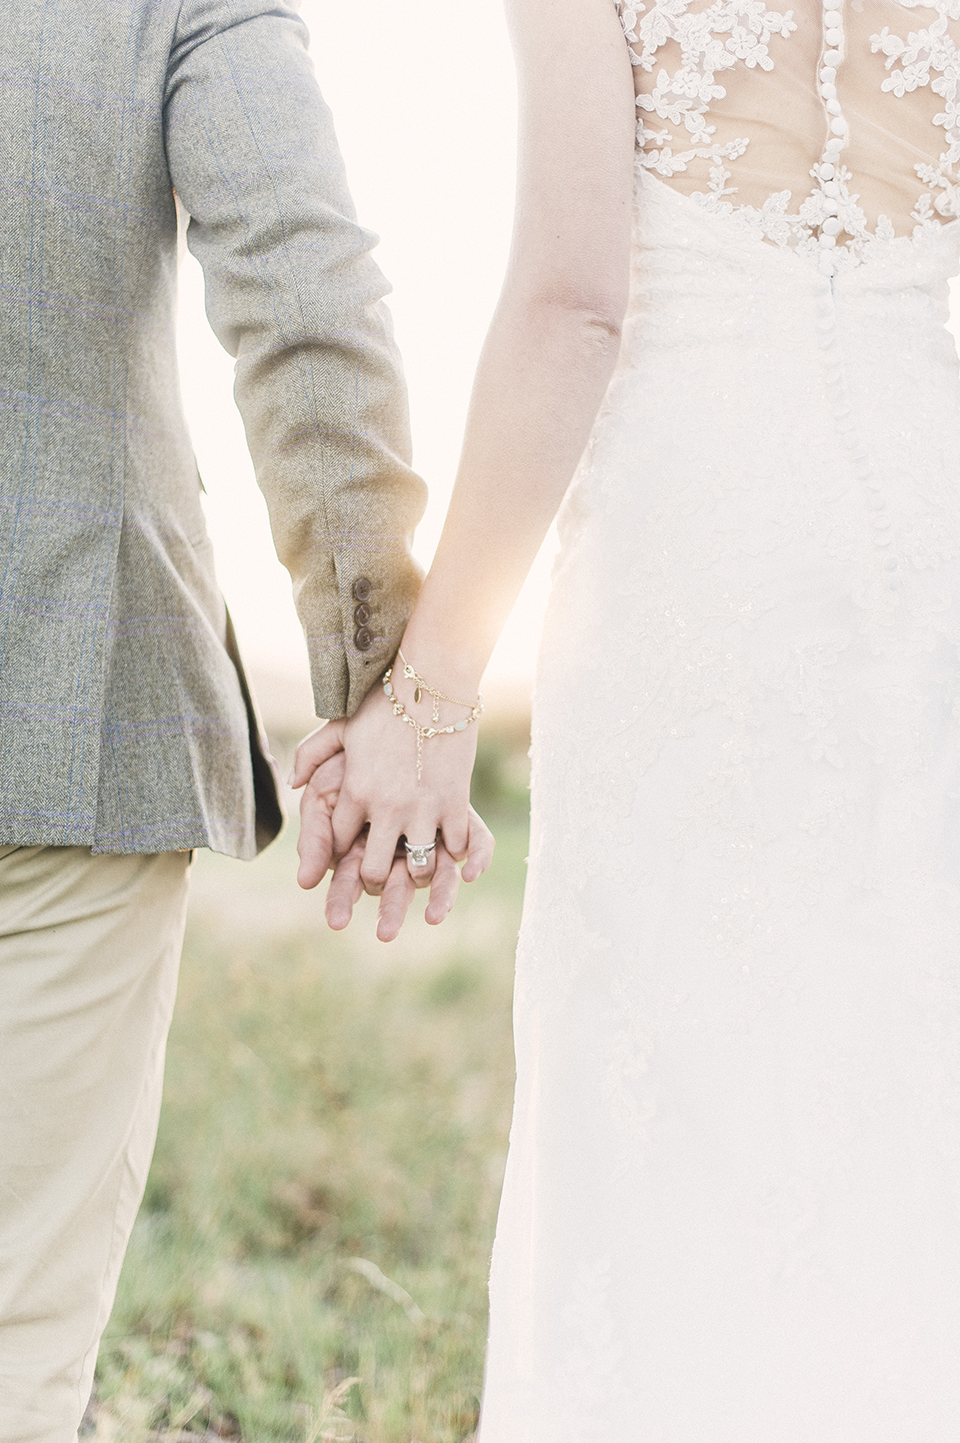 RyanParker_WeddingPhotographer_FineArt_CapeTown_Robertson_PatBusch_Hermanus_M&S_DSC_3552.jpg